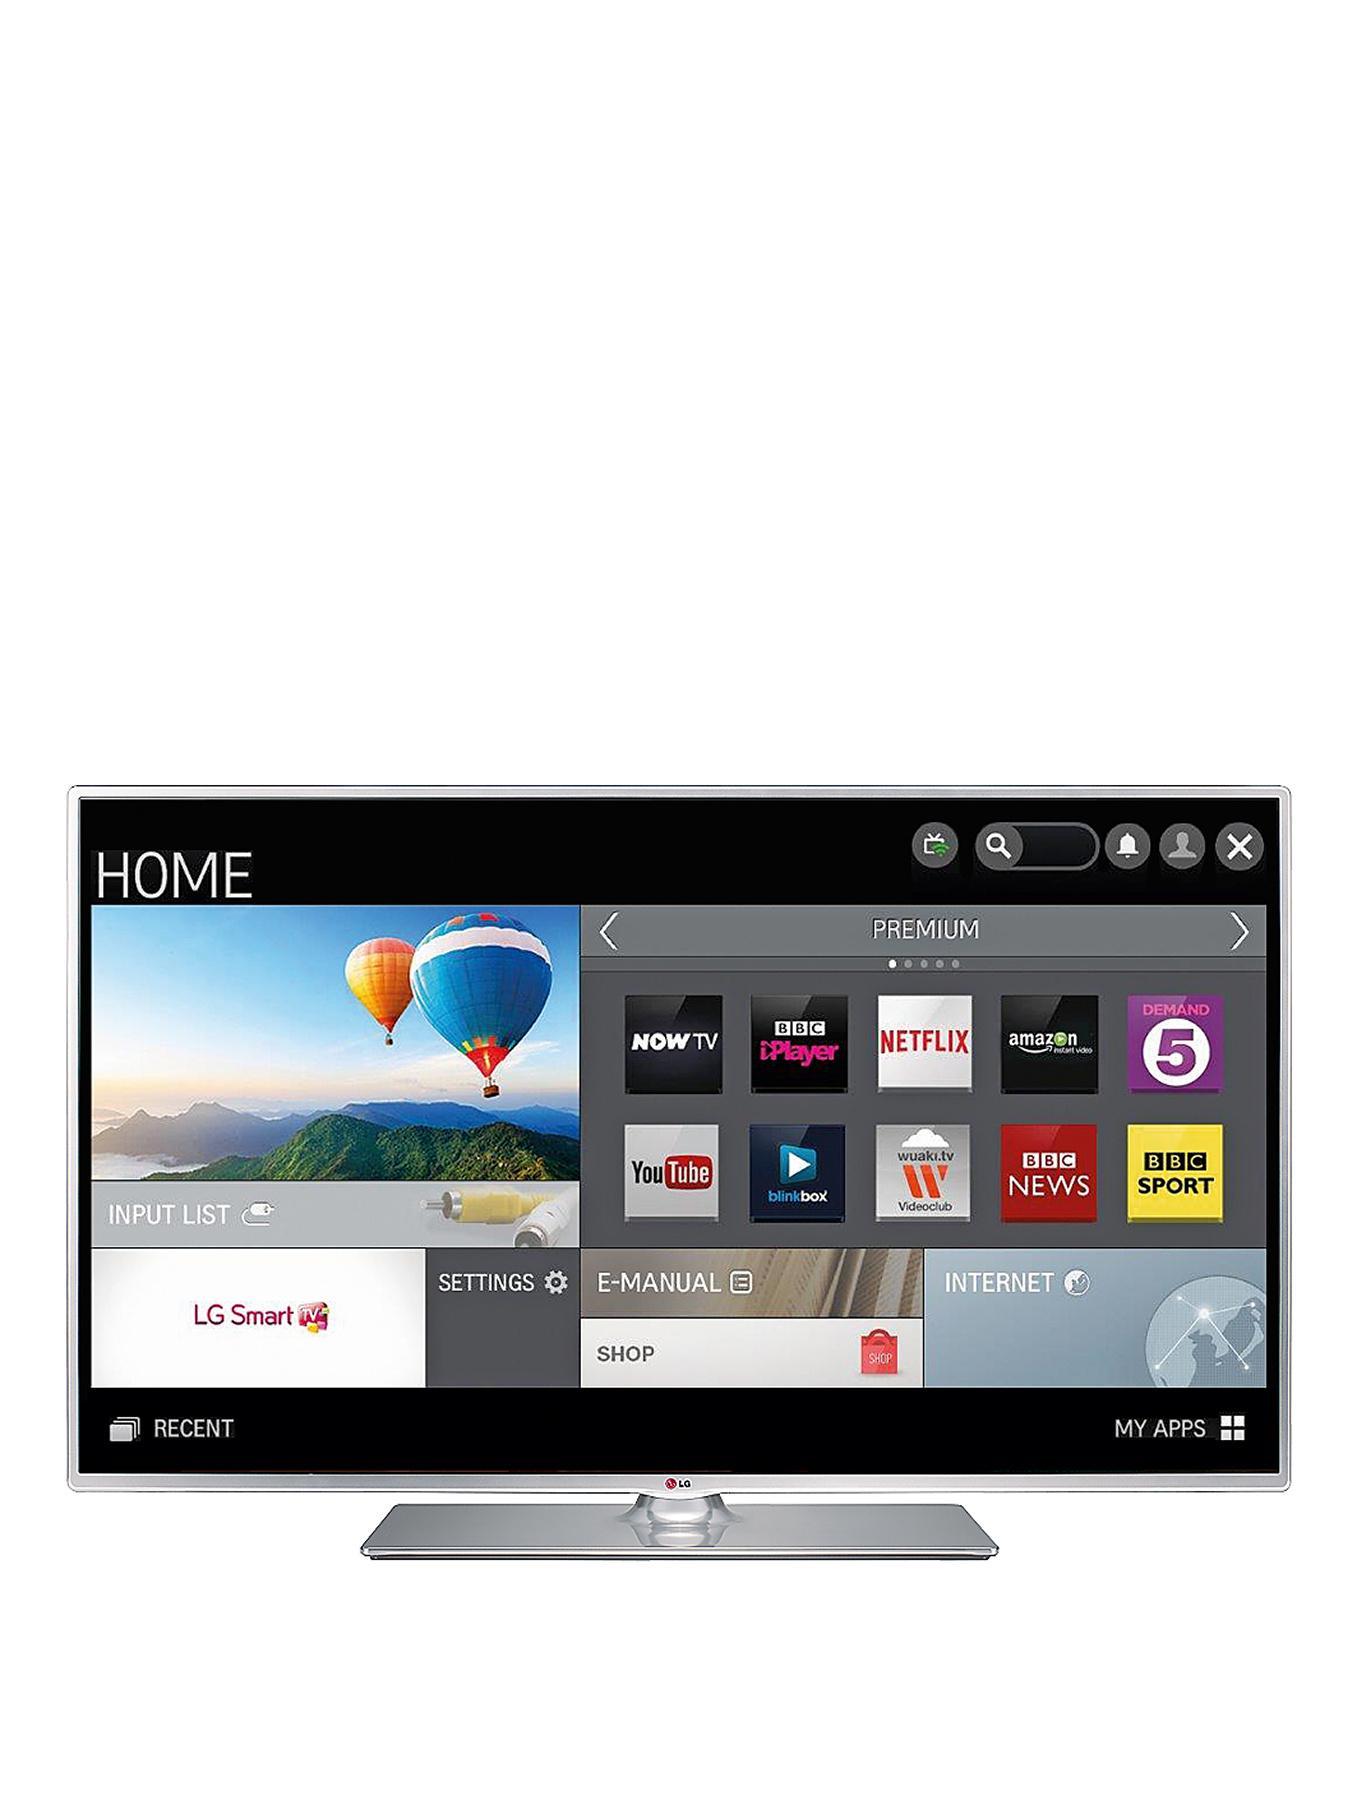 LG 47LB580V 47-inch Widescreen 1080p Full HD Wi-Fi Smart TV